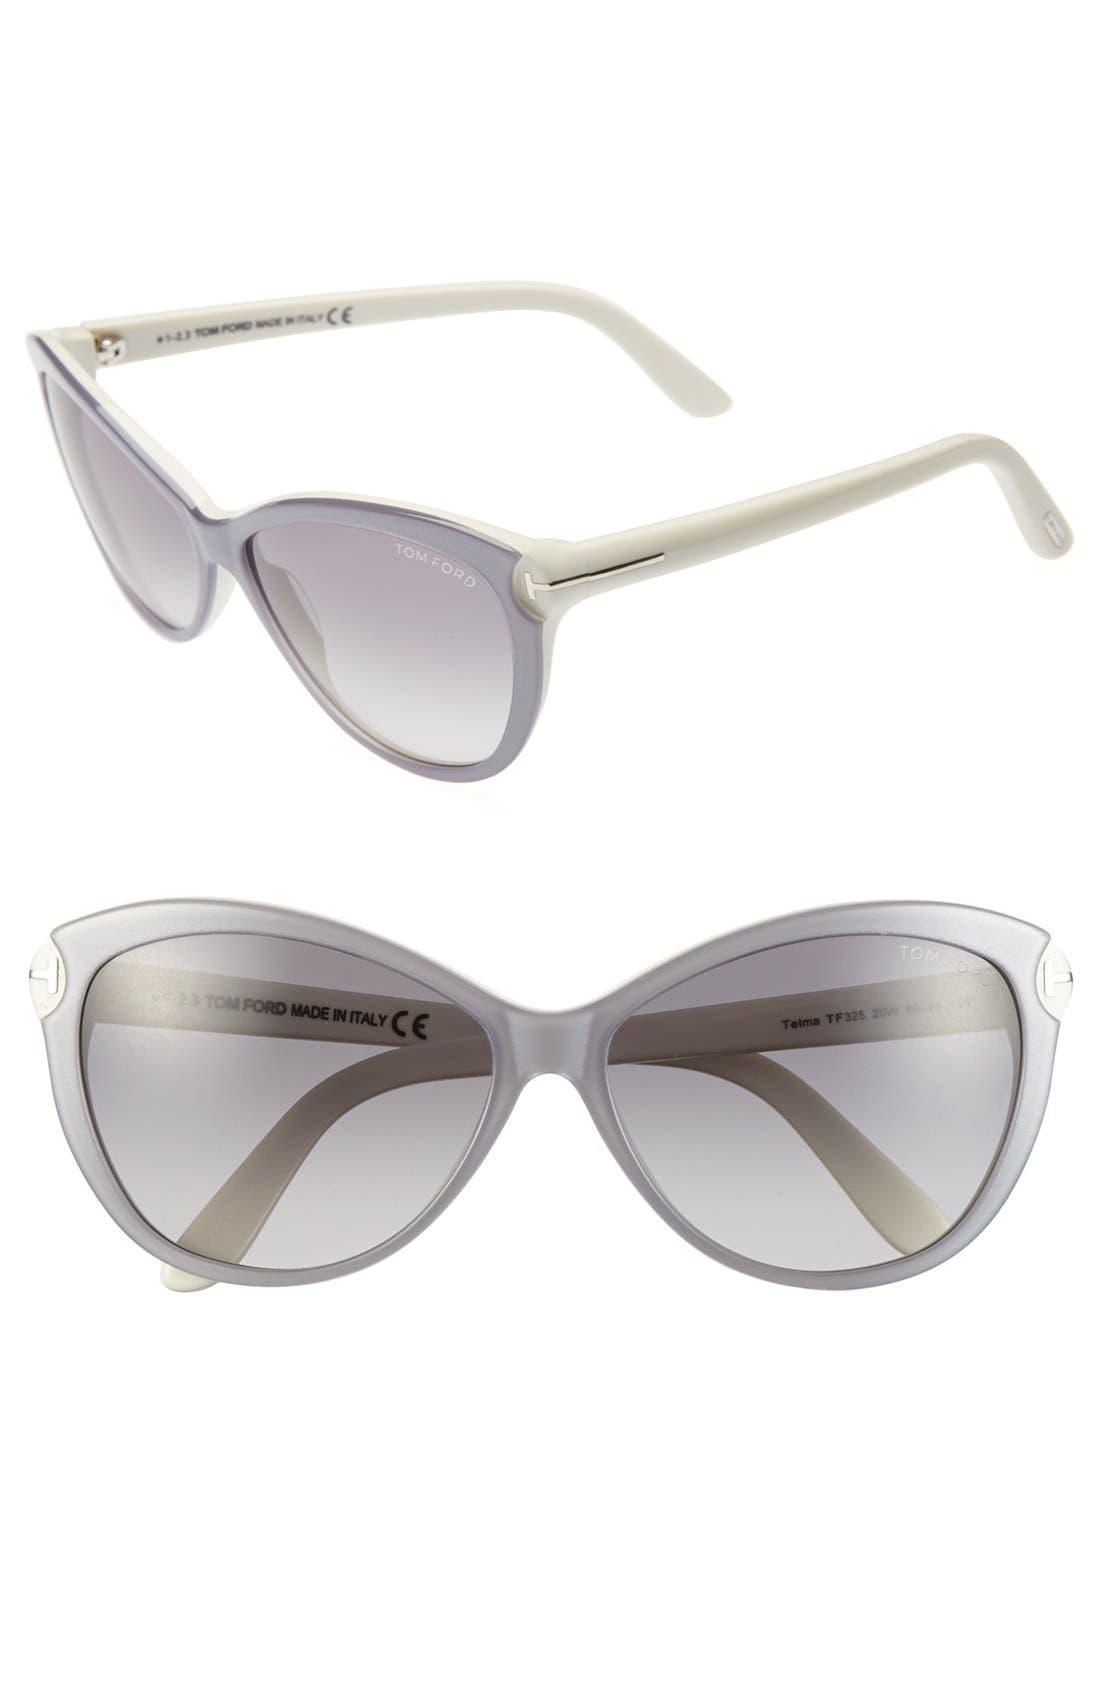 Alternate Image 1 Selected - Tom Ford 'Telma' 60mm Cat Eye Sunglasses